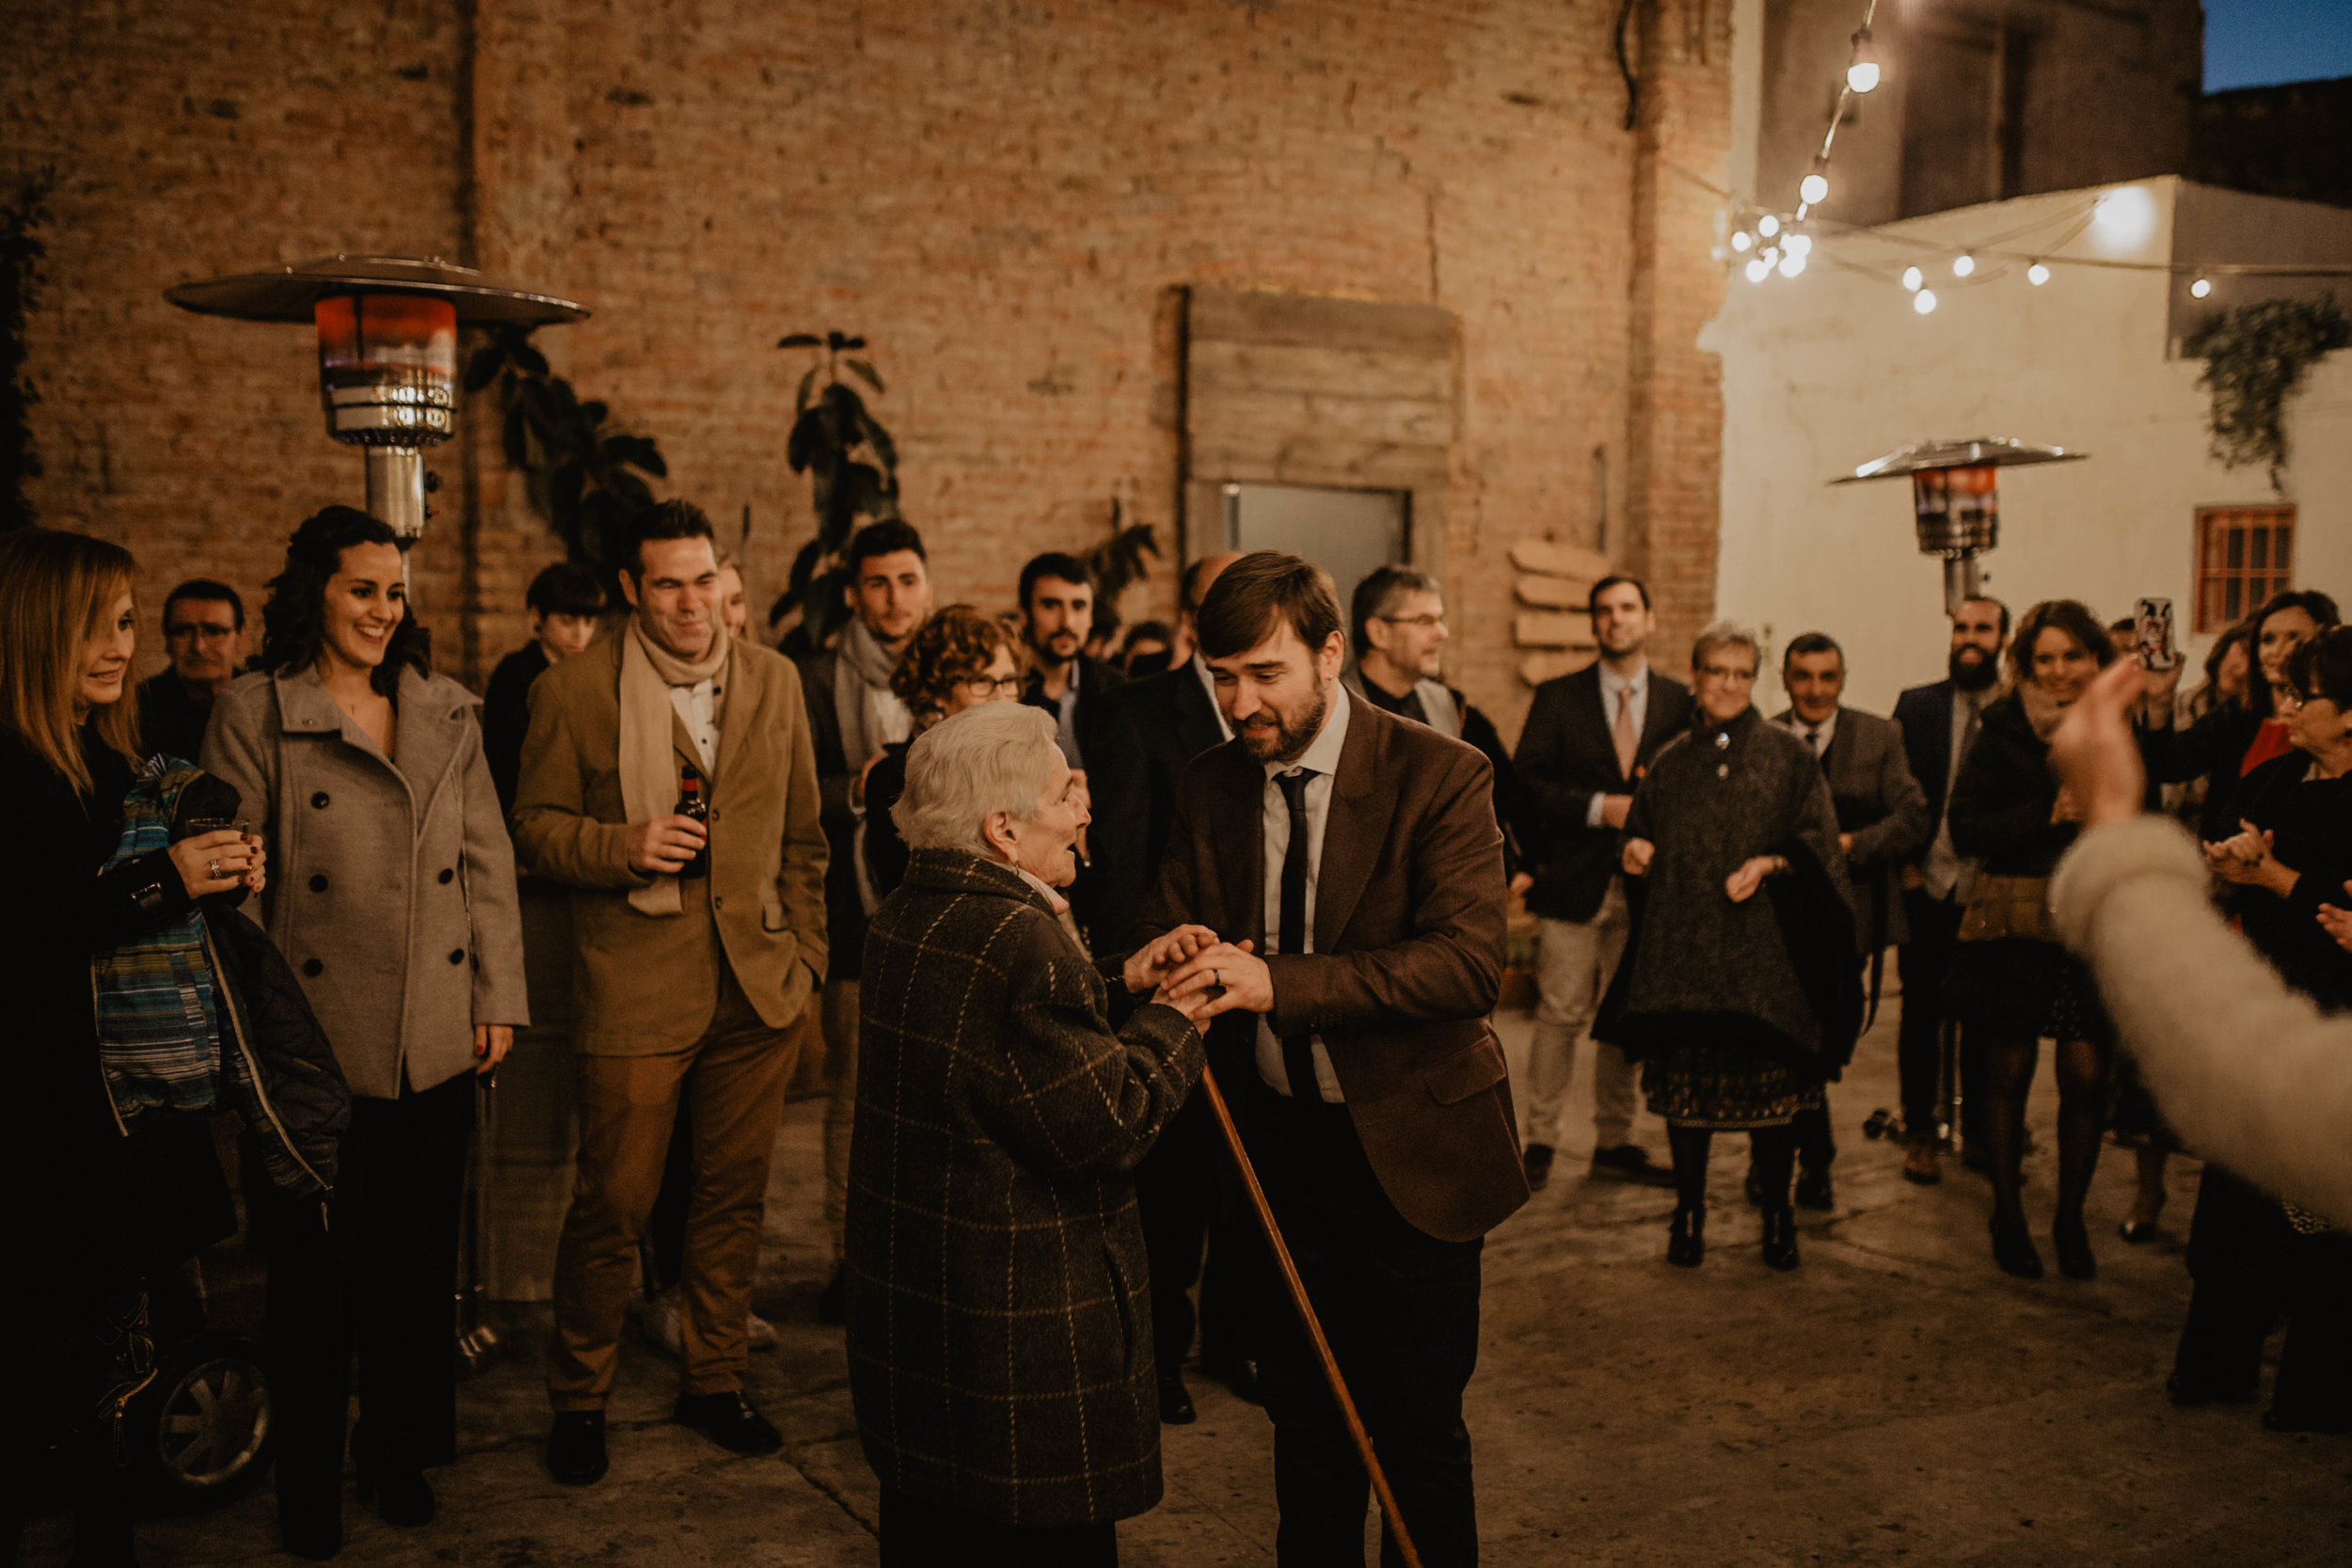 thenortherngirlphotography-photography-weddingphotography-couple-bodasconestilo-bodasenbarcelona-martadavid-784.jpg